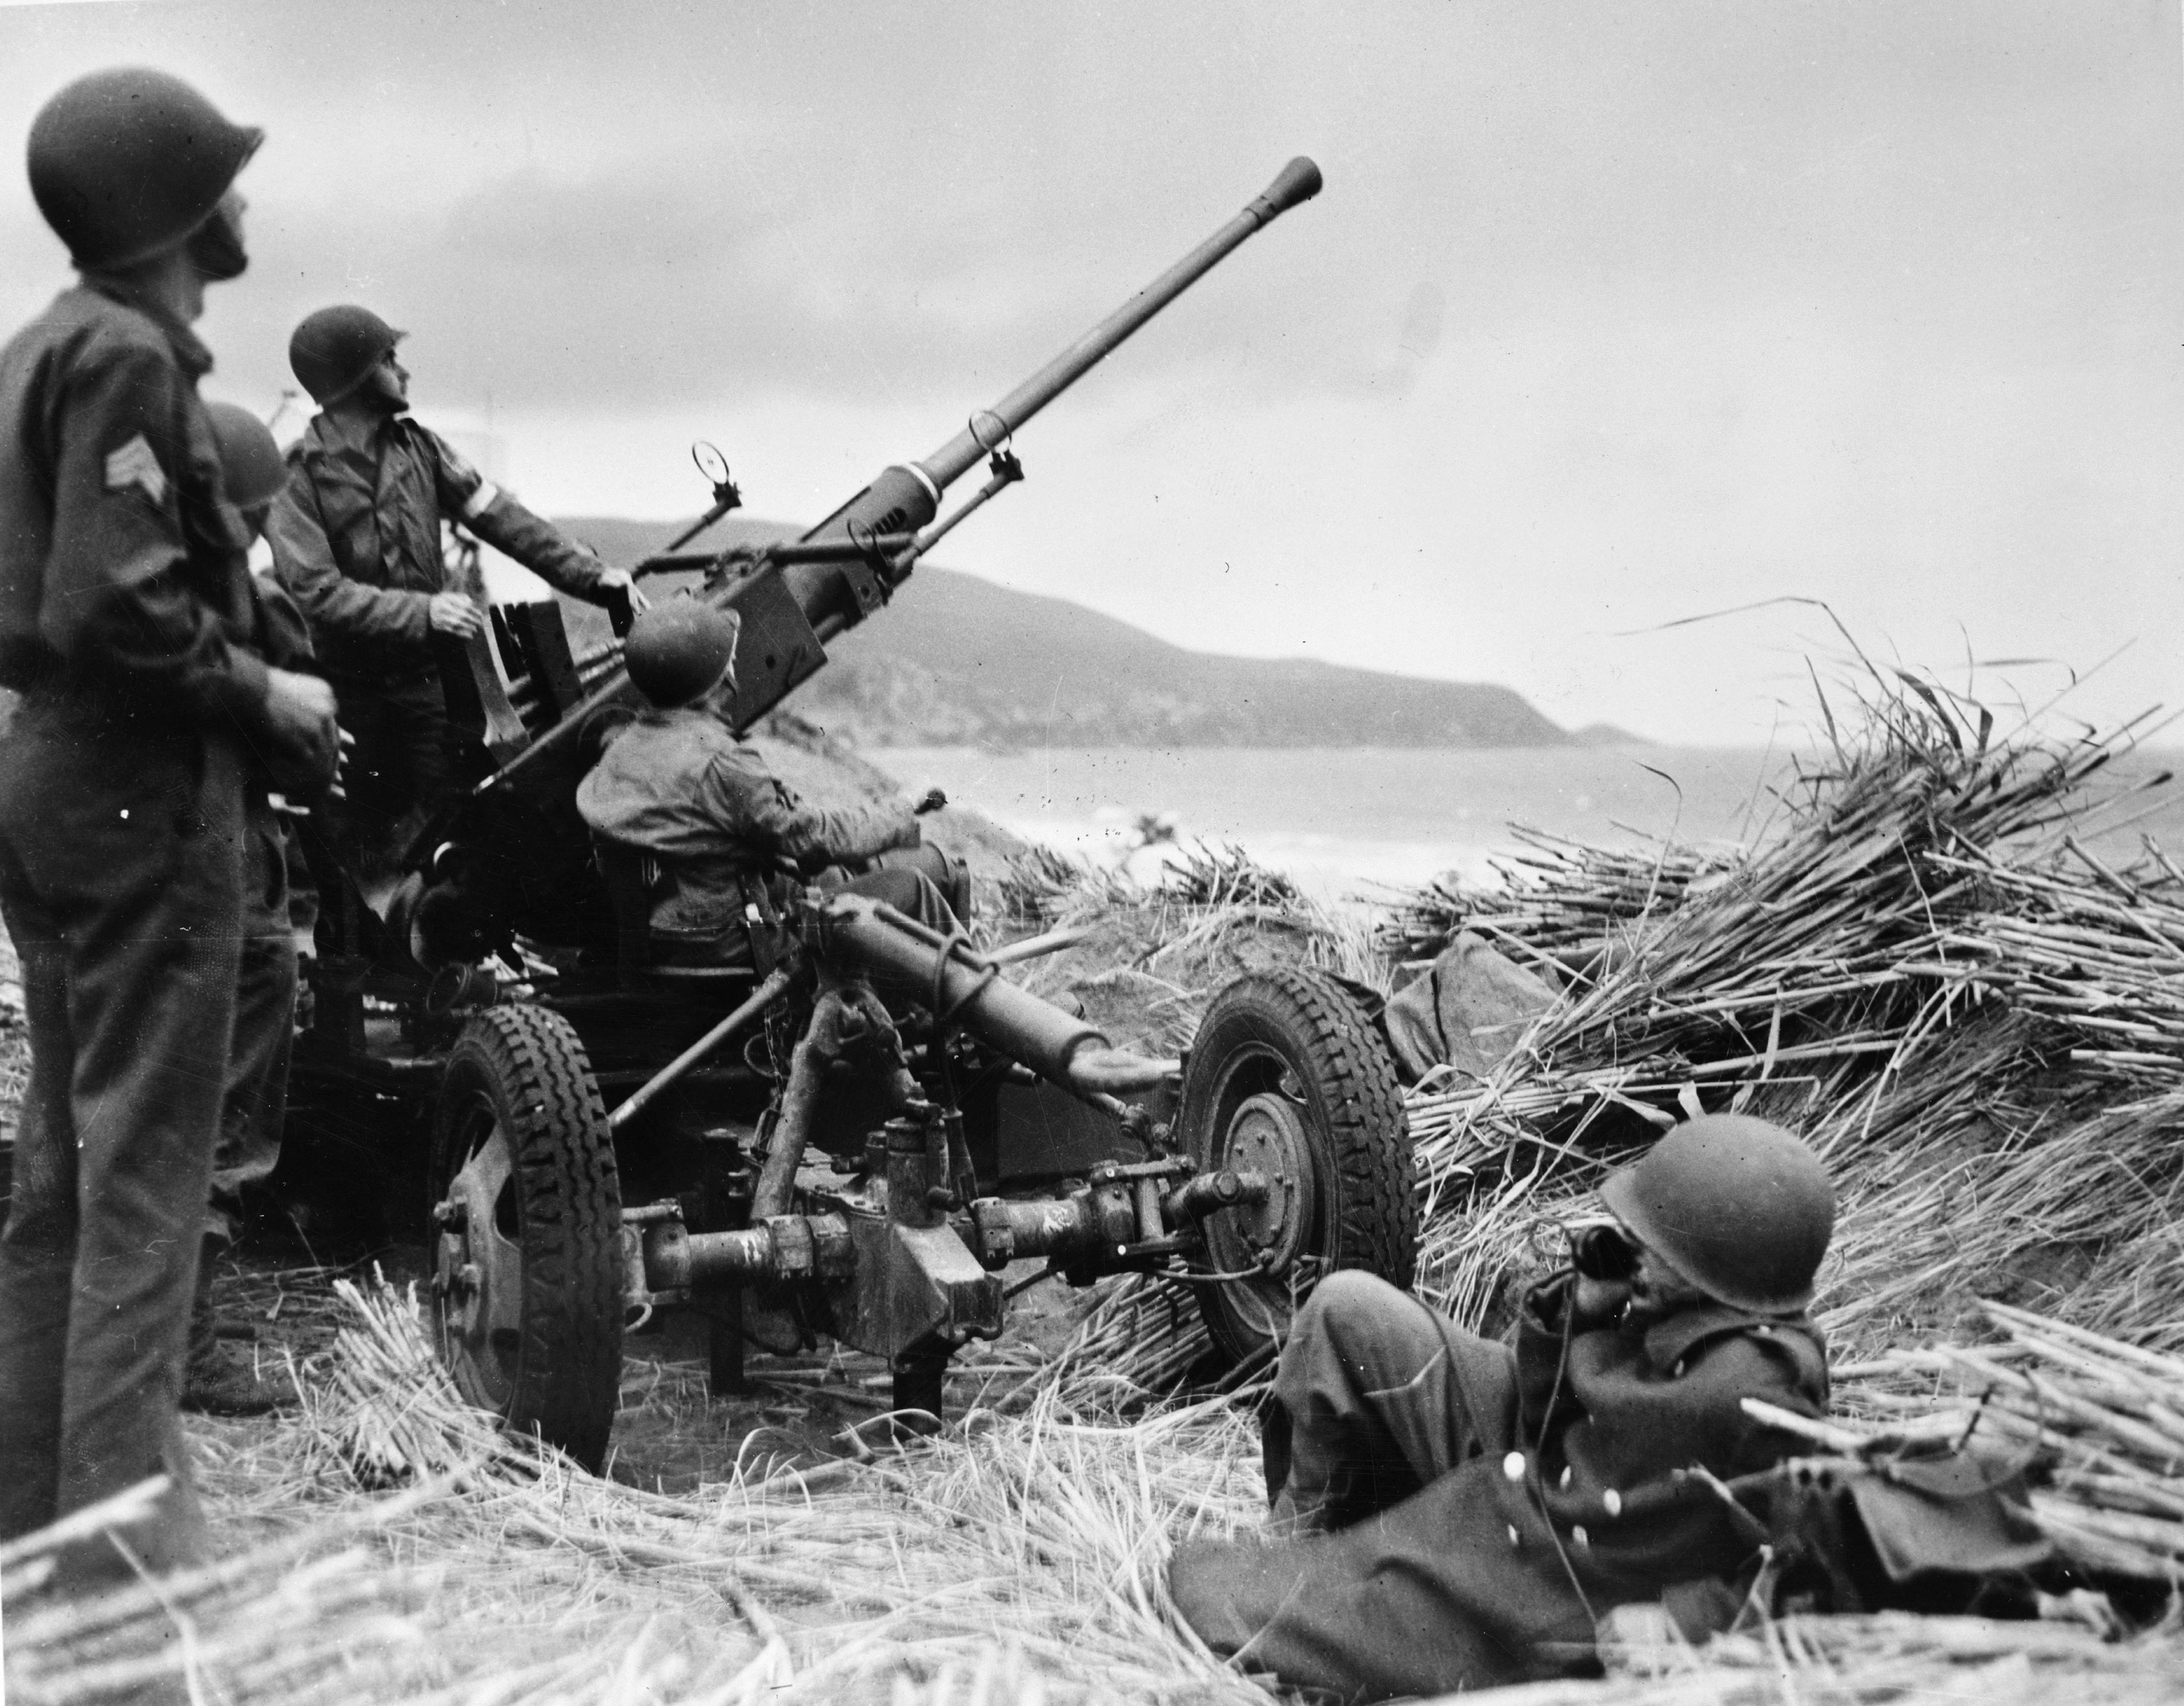 File:Bofors-aa-gun-algeria.jpg - Wikipedia ...